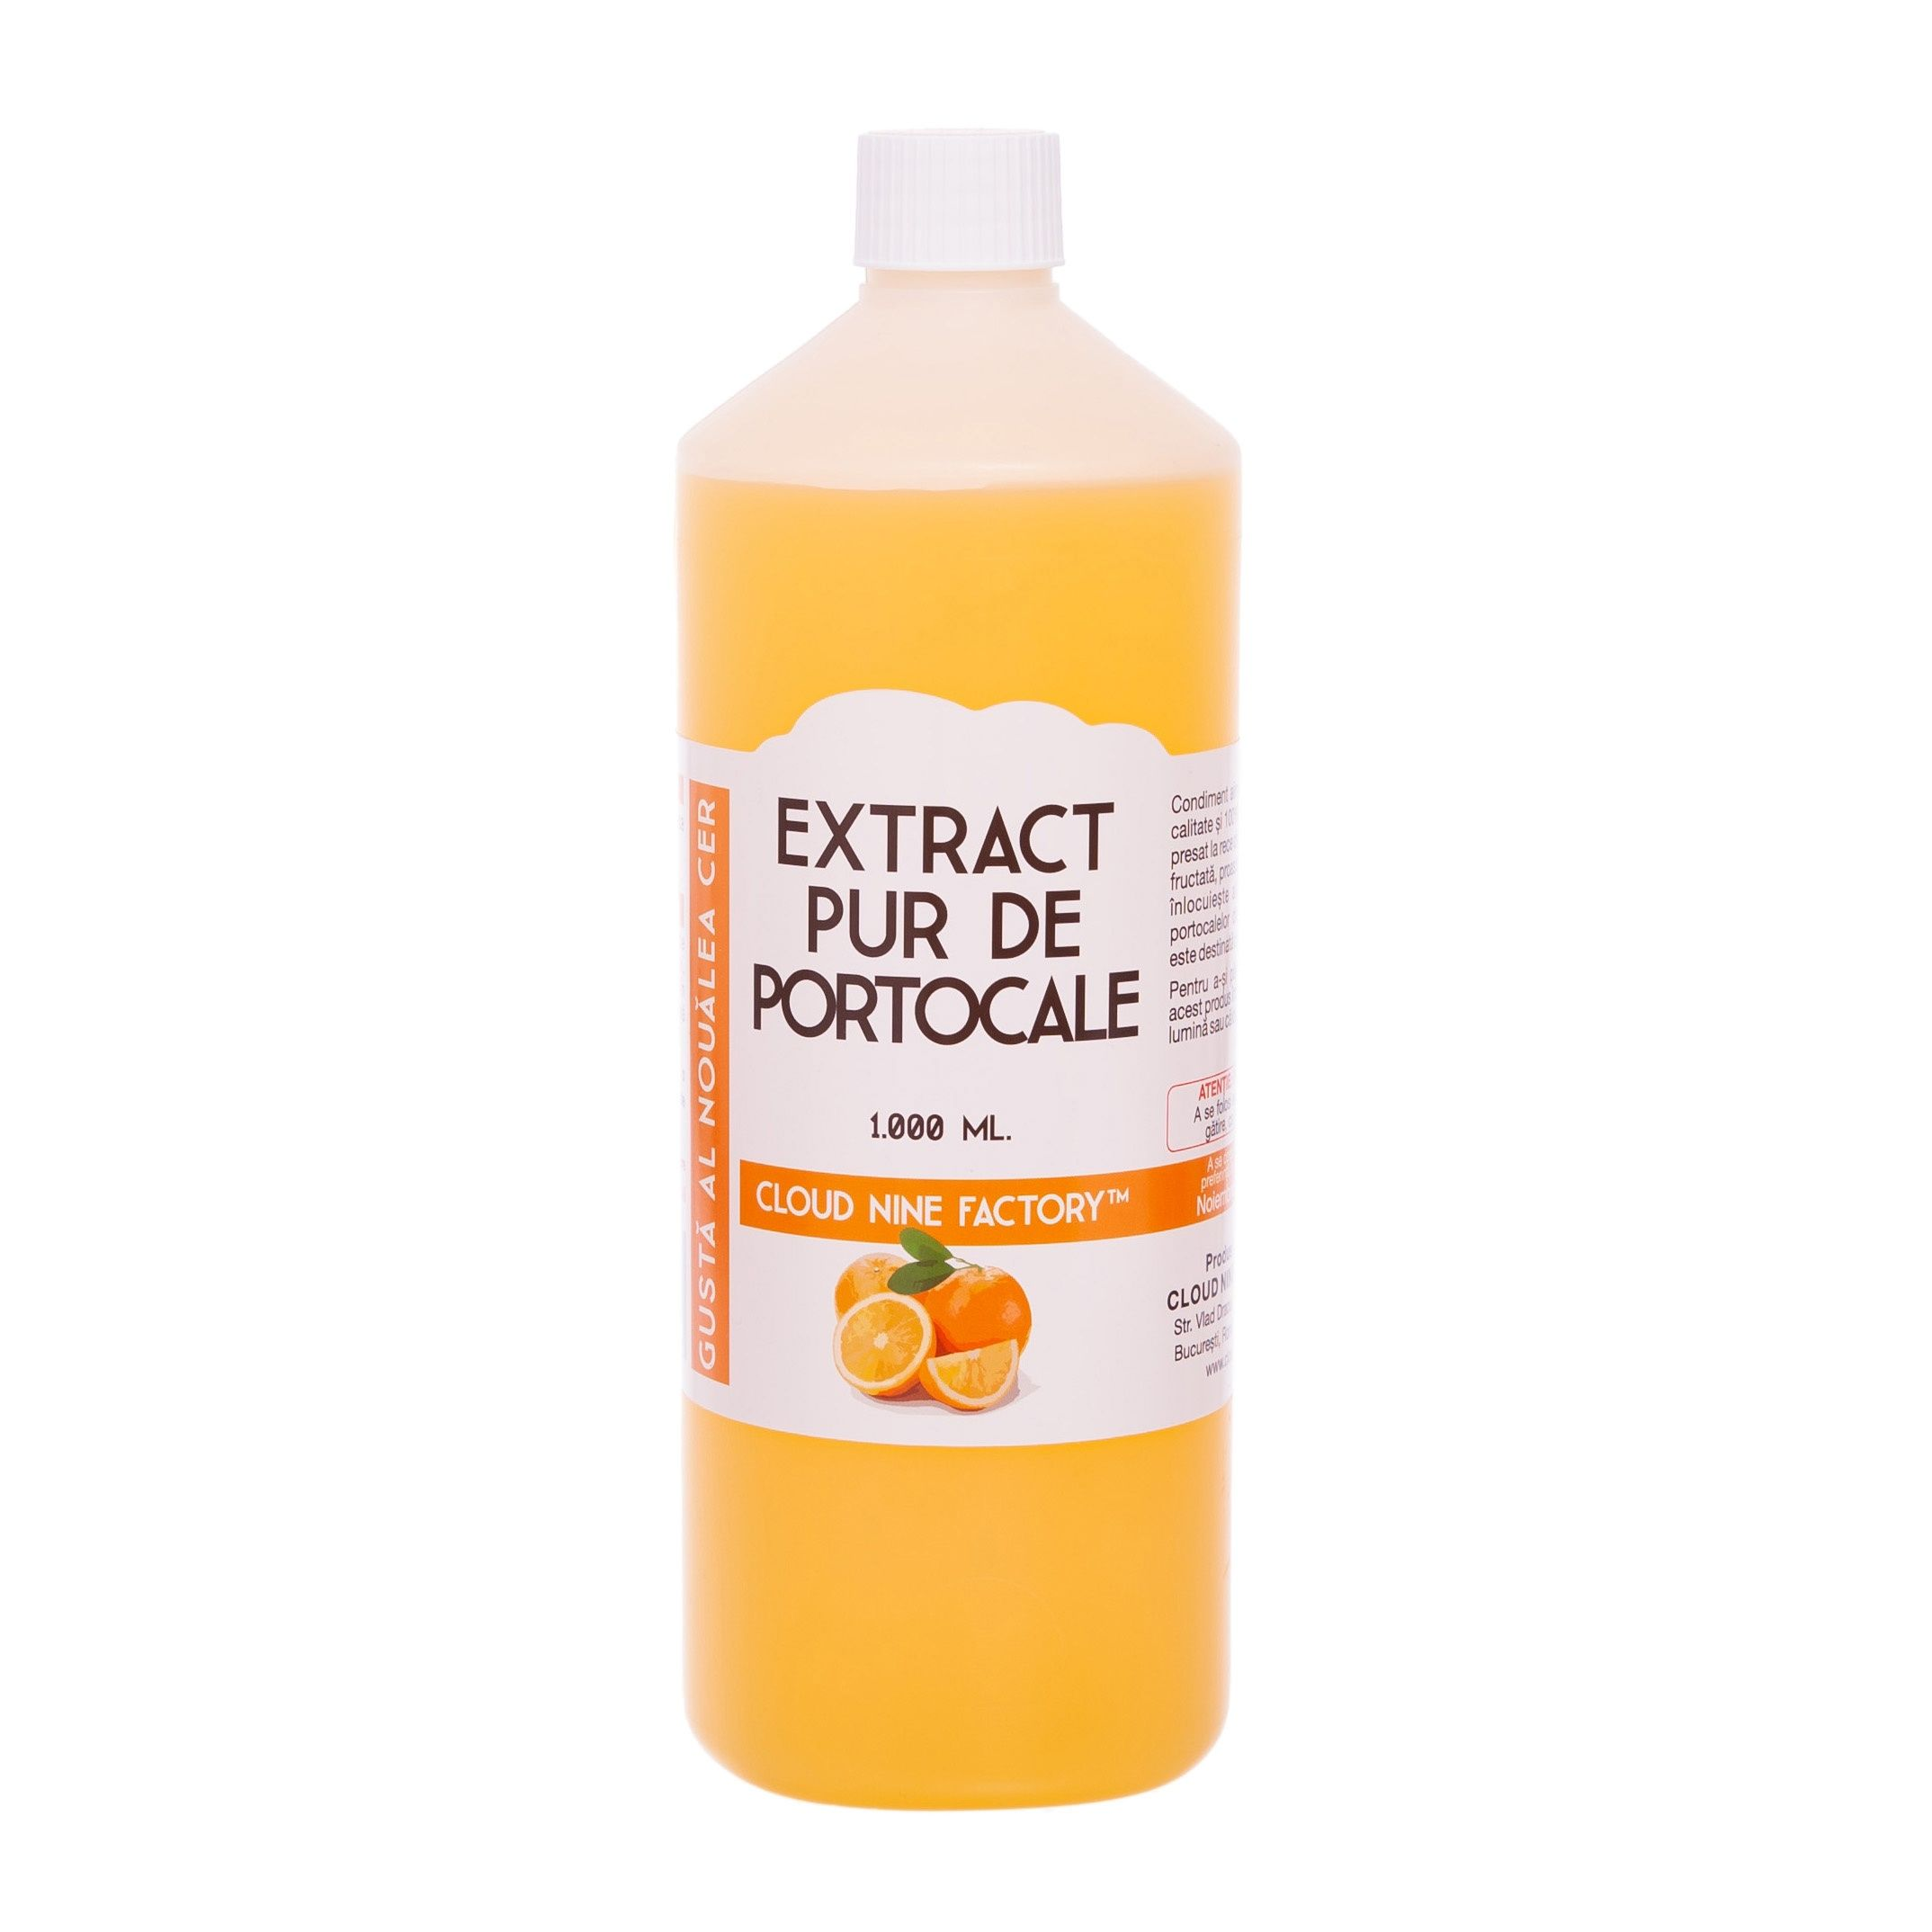 Extract Pur de Portocale (1.000 ml.) extract pur de portocale (1.000 ml.) - IMG 2653 - Extract Pur de Portocale (1.000 ml.) cloud nine factory - IMG 2653 - Extract Pur de Portocale